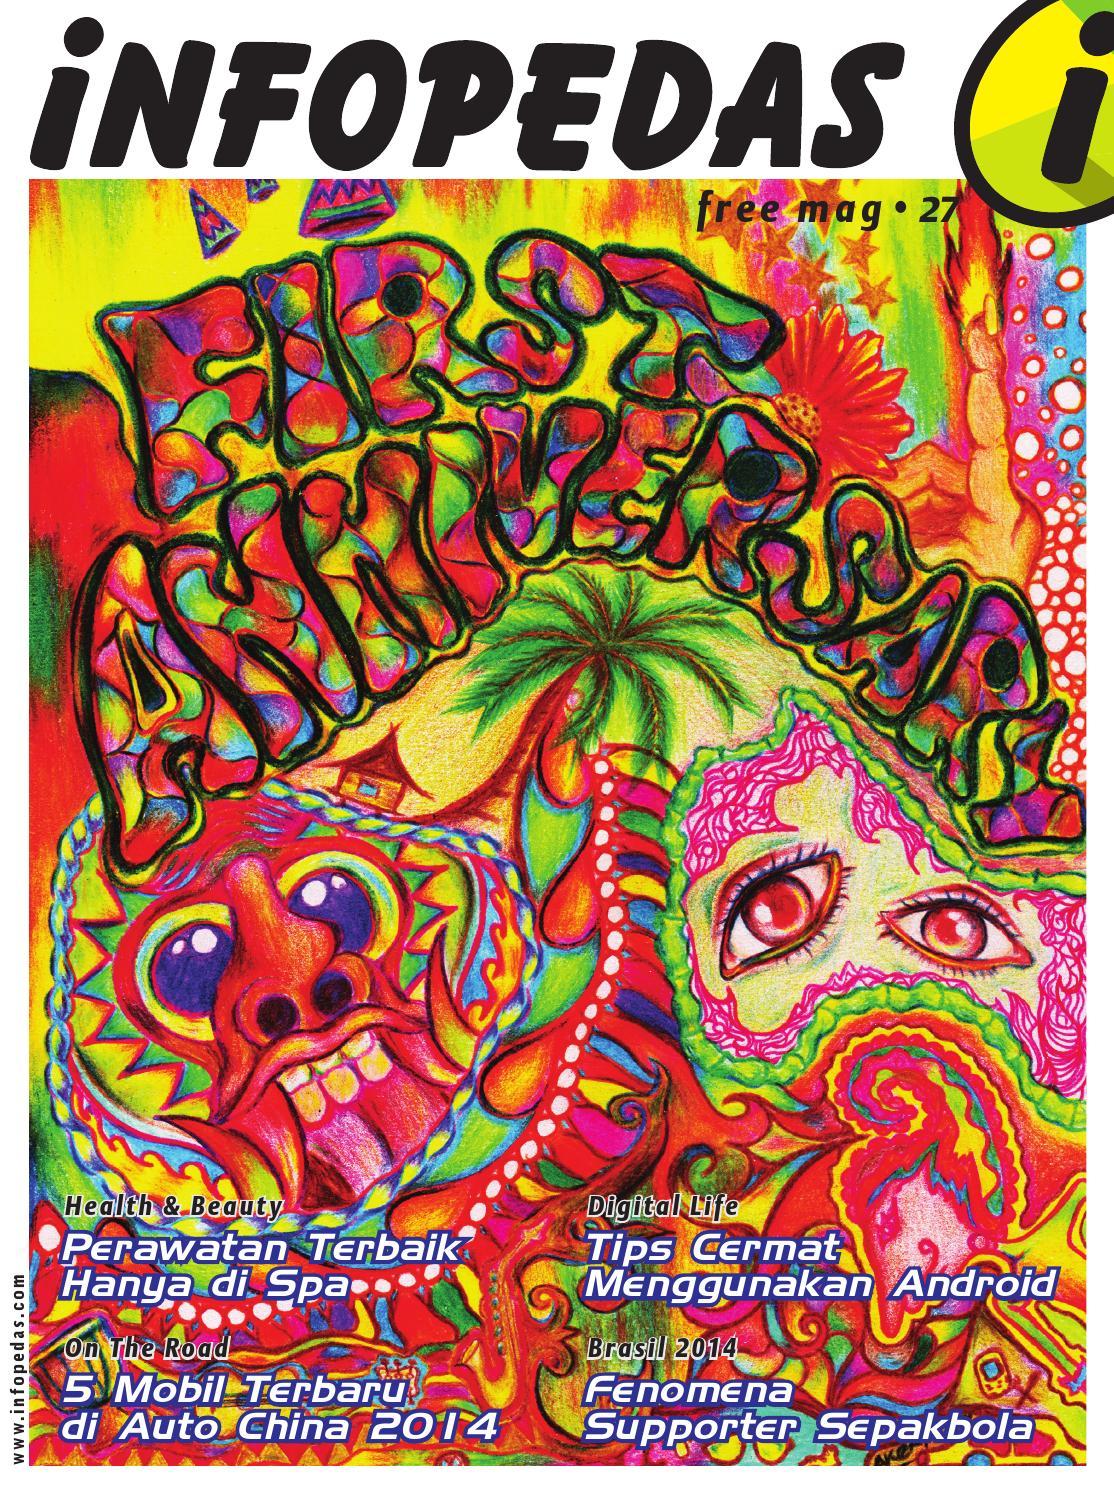 Majalah Infopedas Edisi 27 By Pedas Issuu Produk Ukm Bumn Tekiro Tang Kombinasi 7